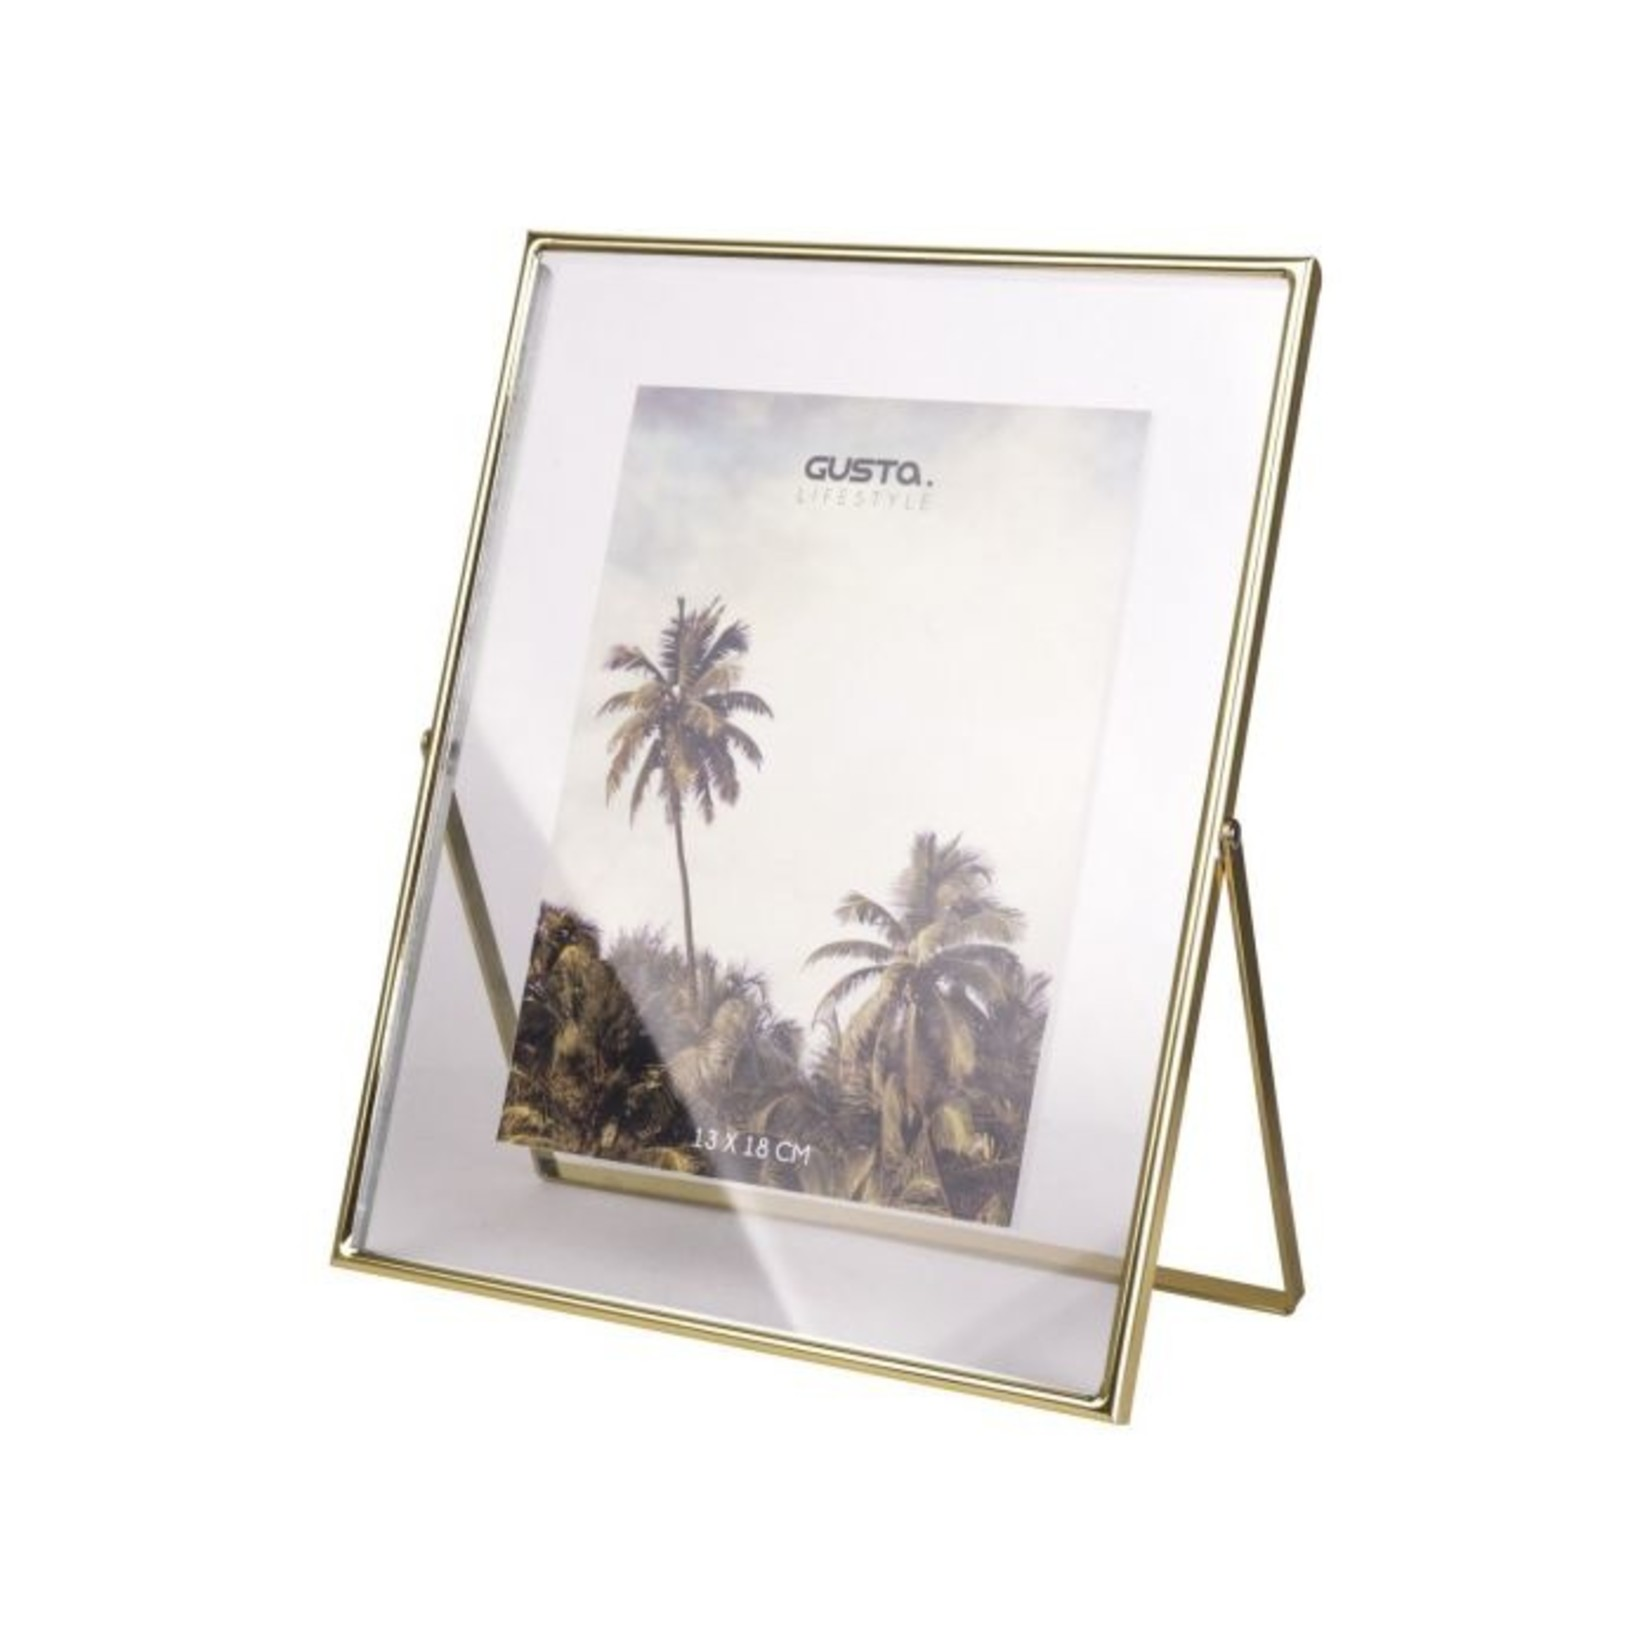 Gusta Fotolijst - 20x25cm - Goud